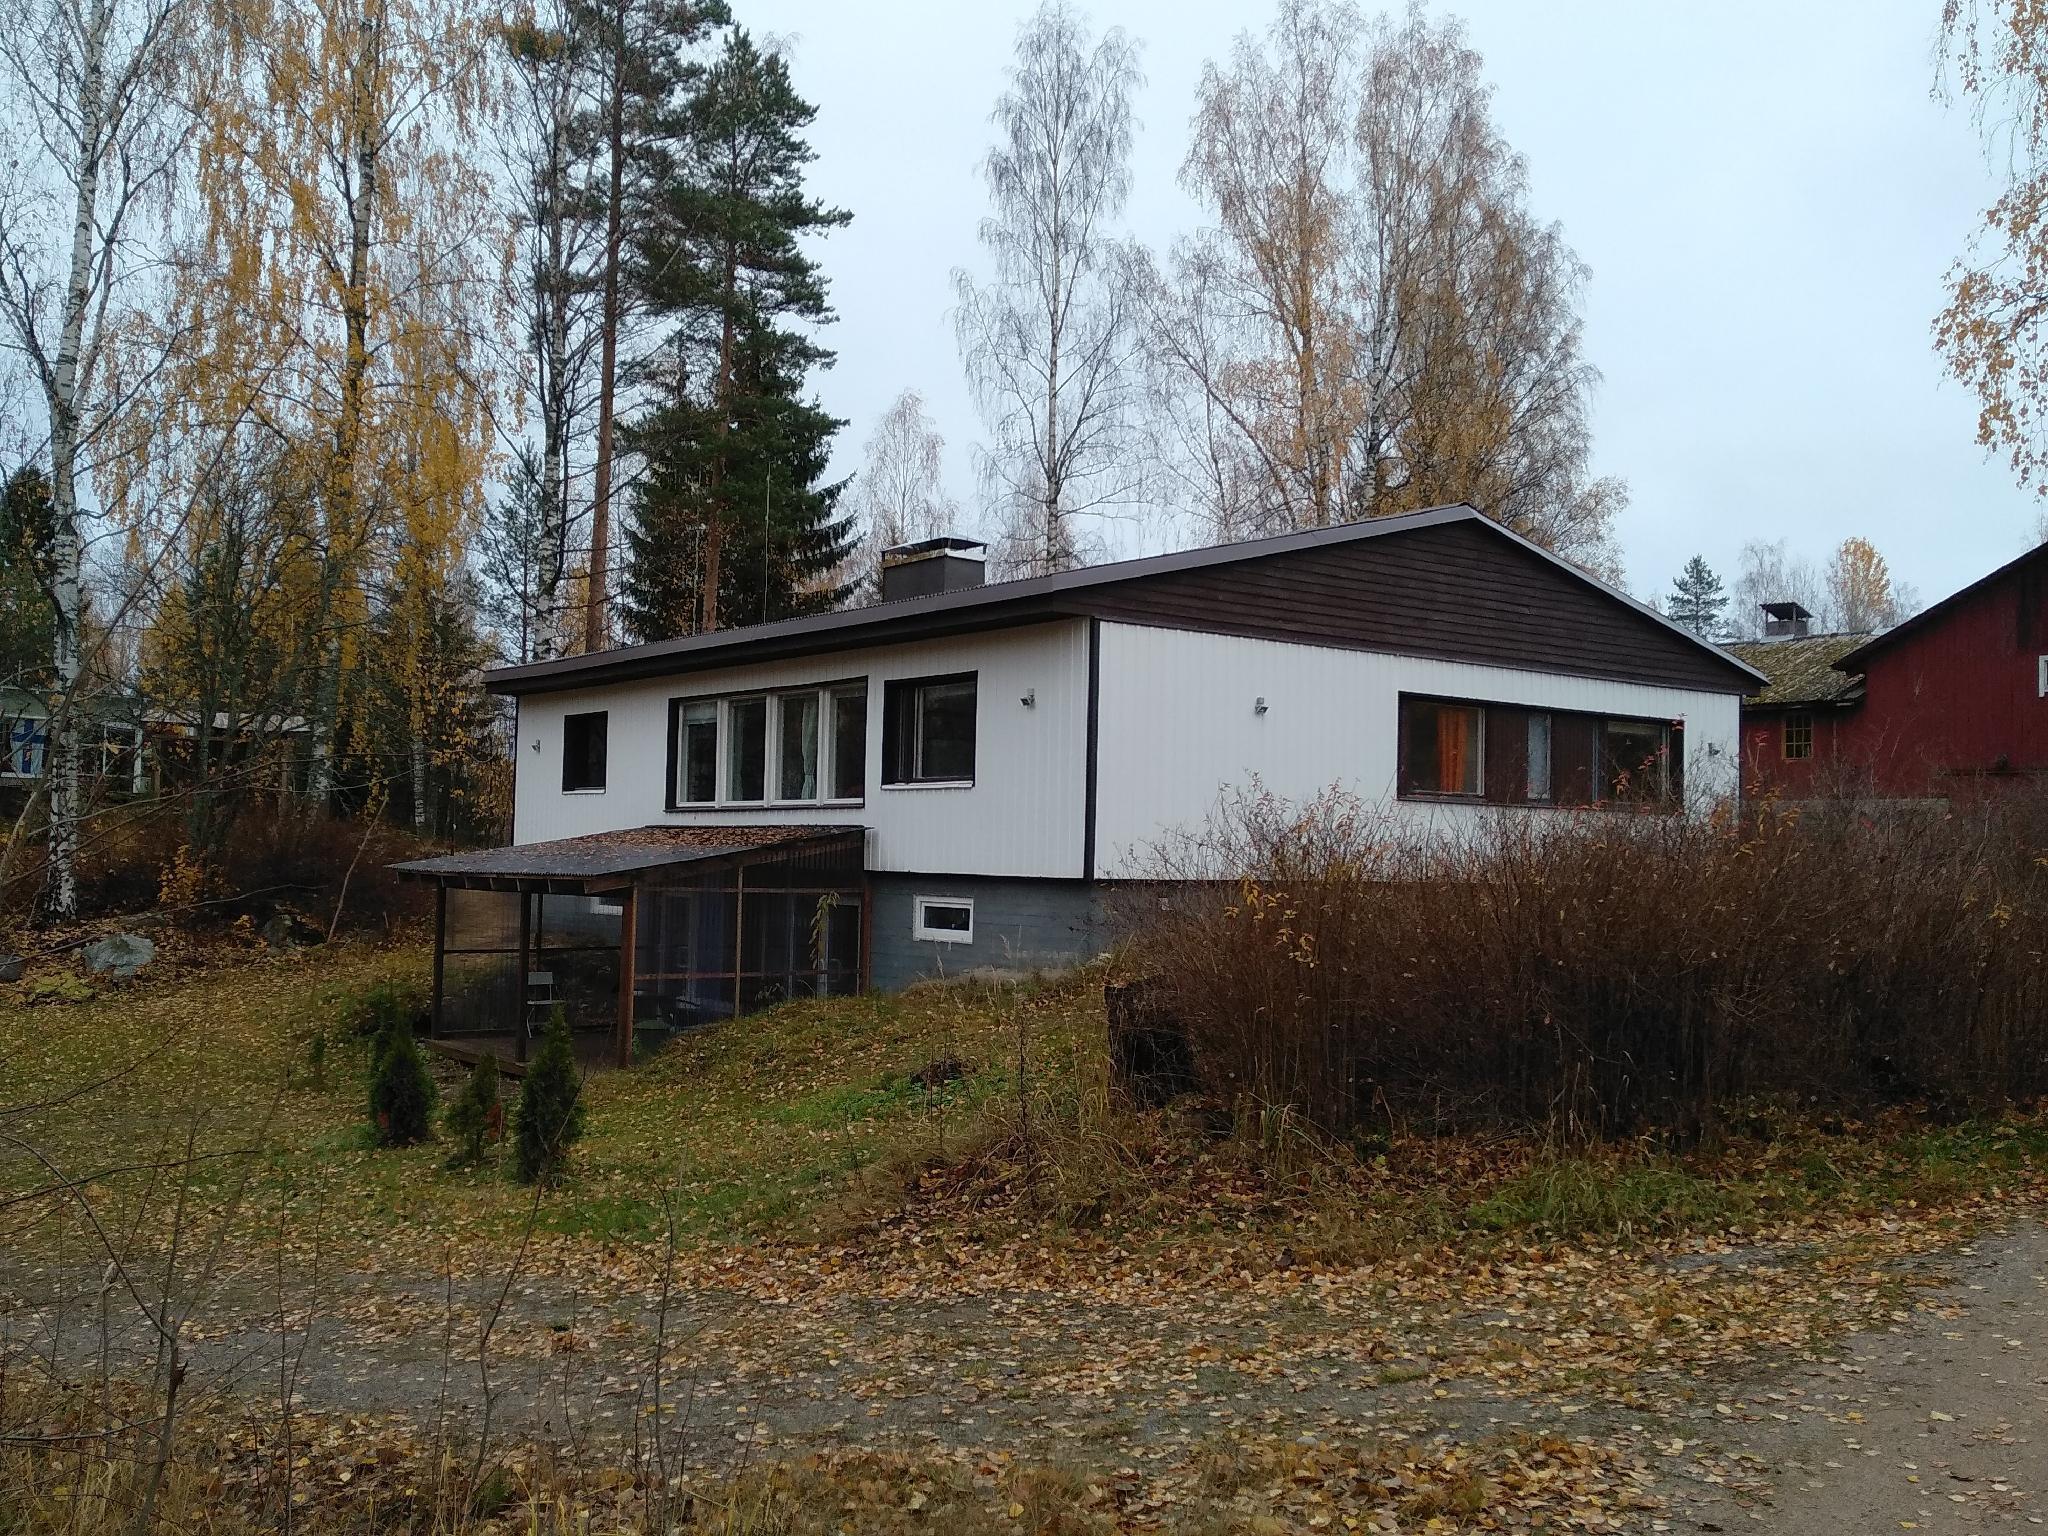 Cottage Viardo Big House For Friendly Companies